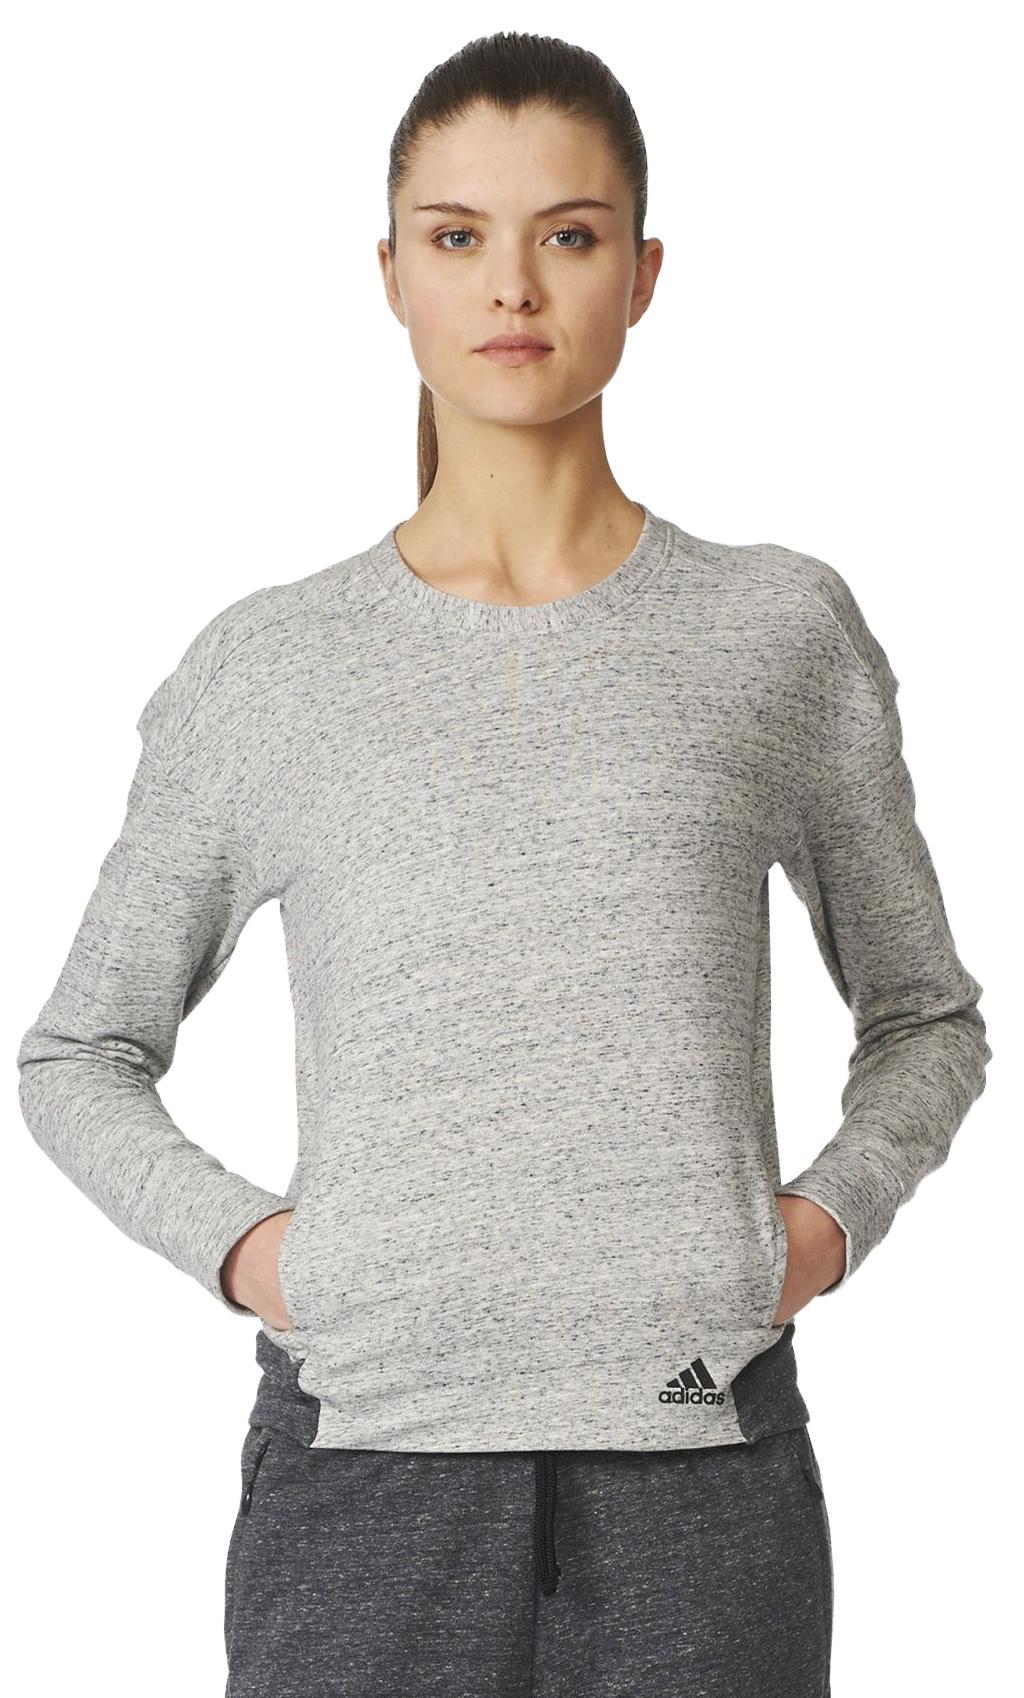 9229a8498 Adidas Cotton Fleece Crew Sweatshirt - Women's | MEC